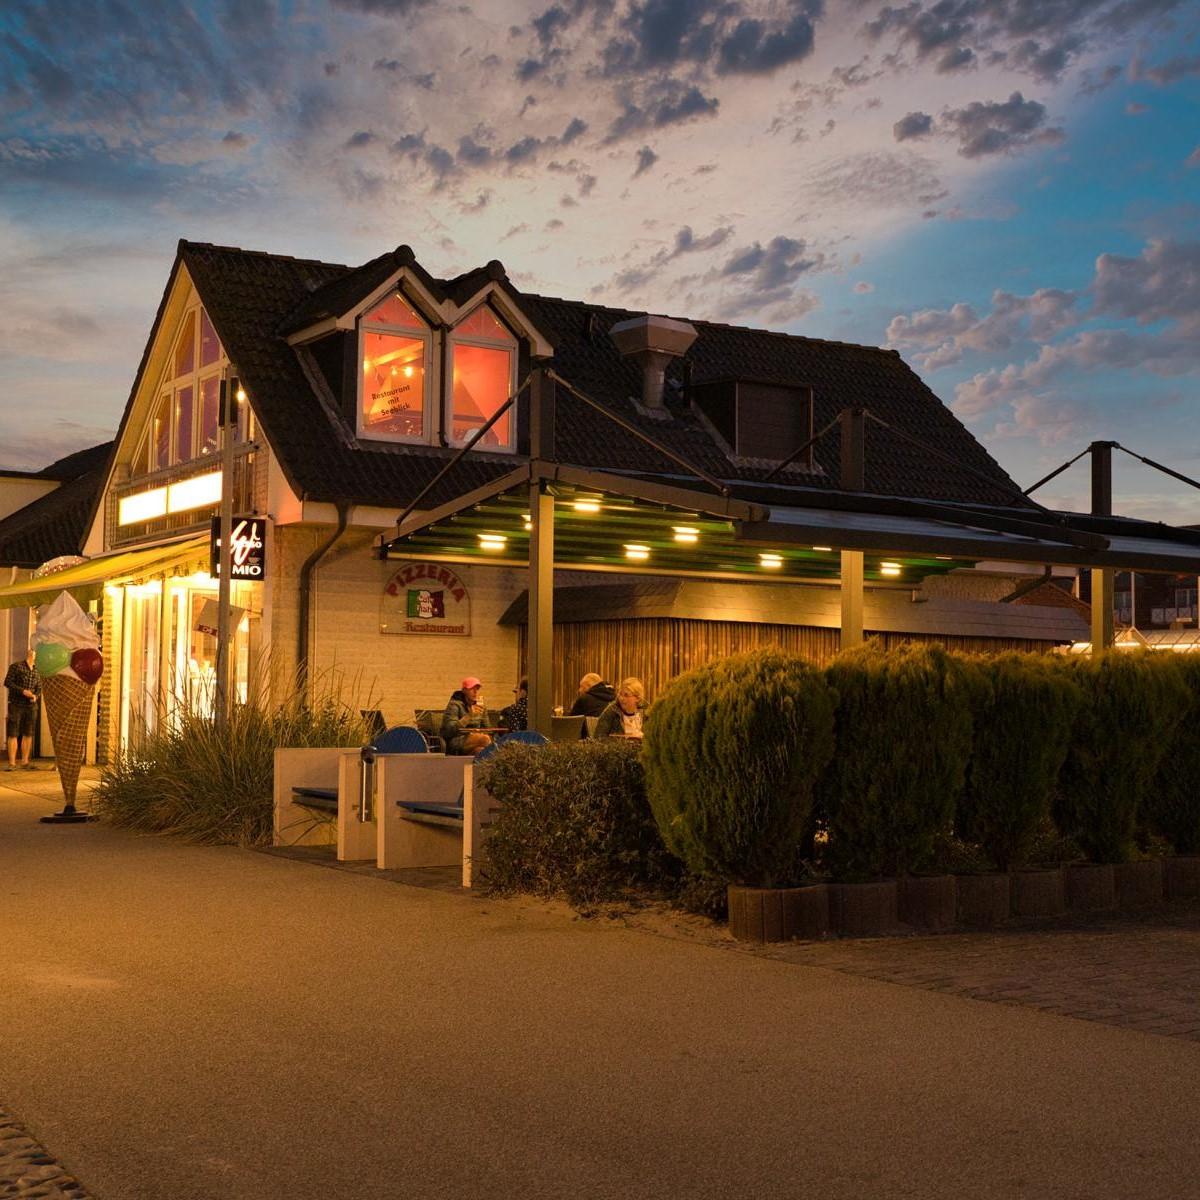 pergola marin palmiye terrassenueberdachung gastronomie kellenhusen 40 Q - Gastronomie Terrassenüberdachung